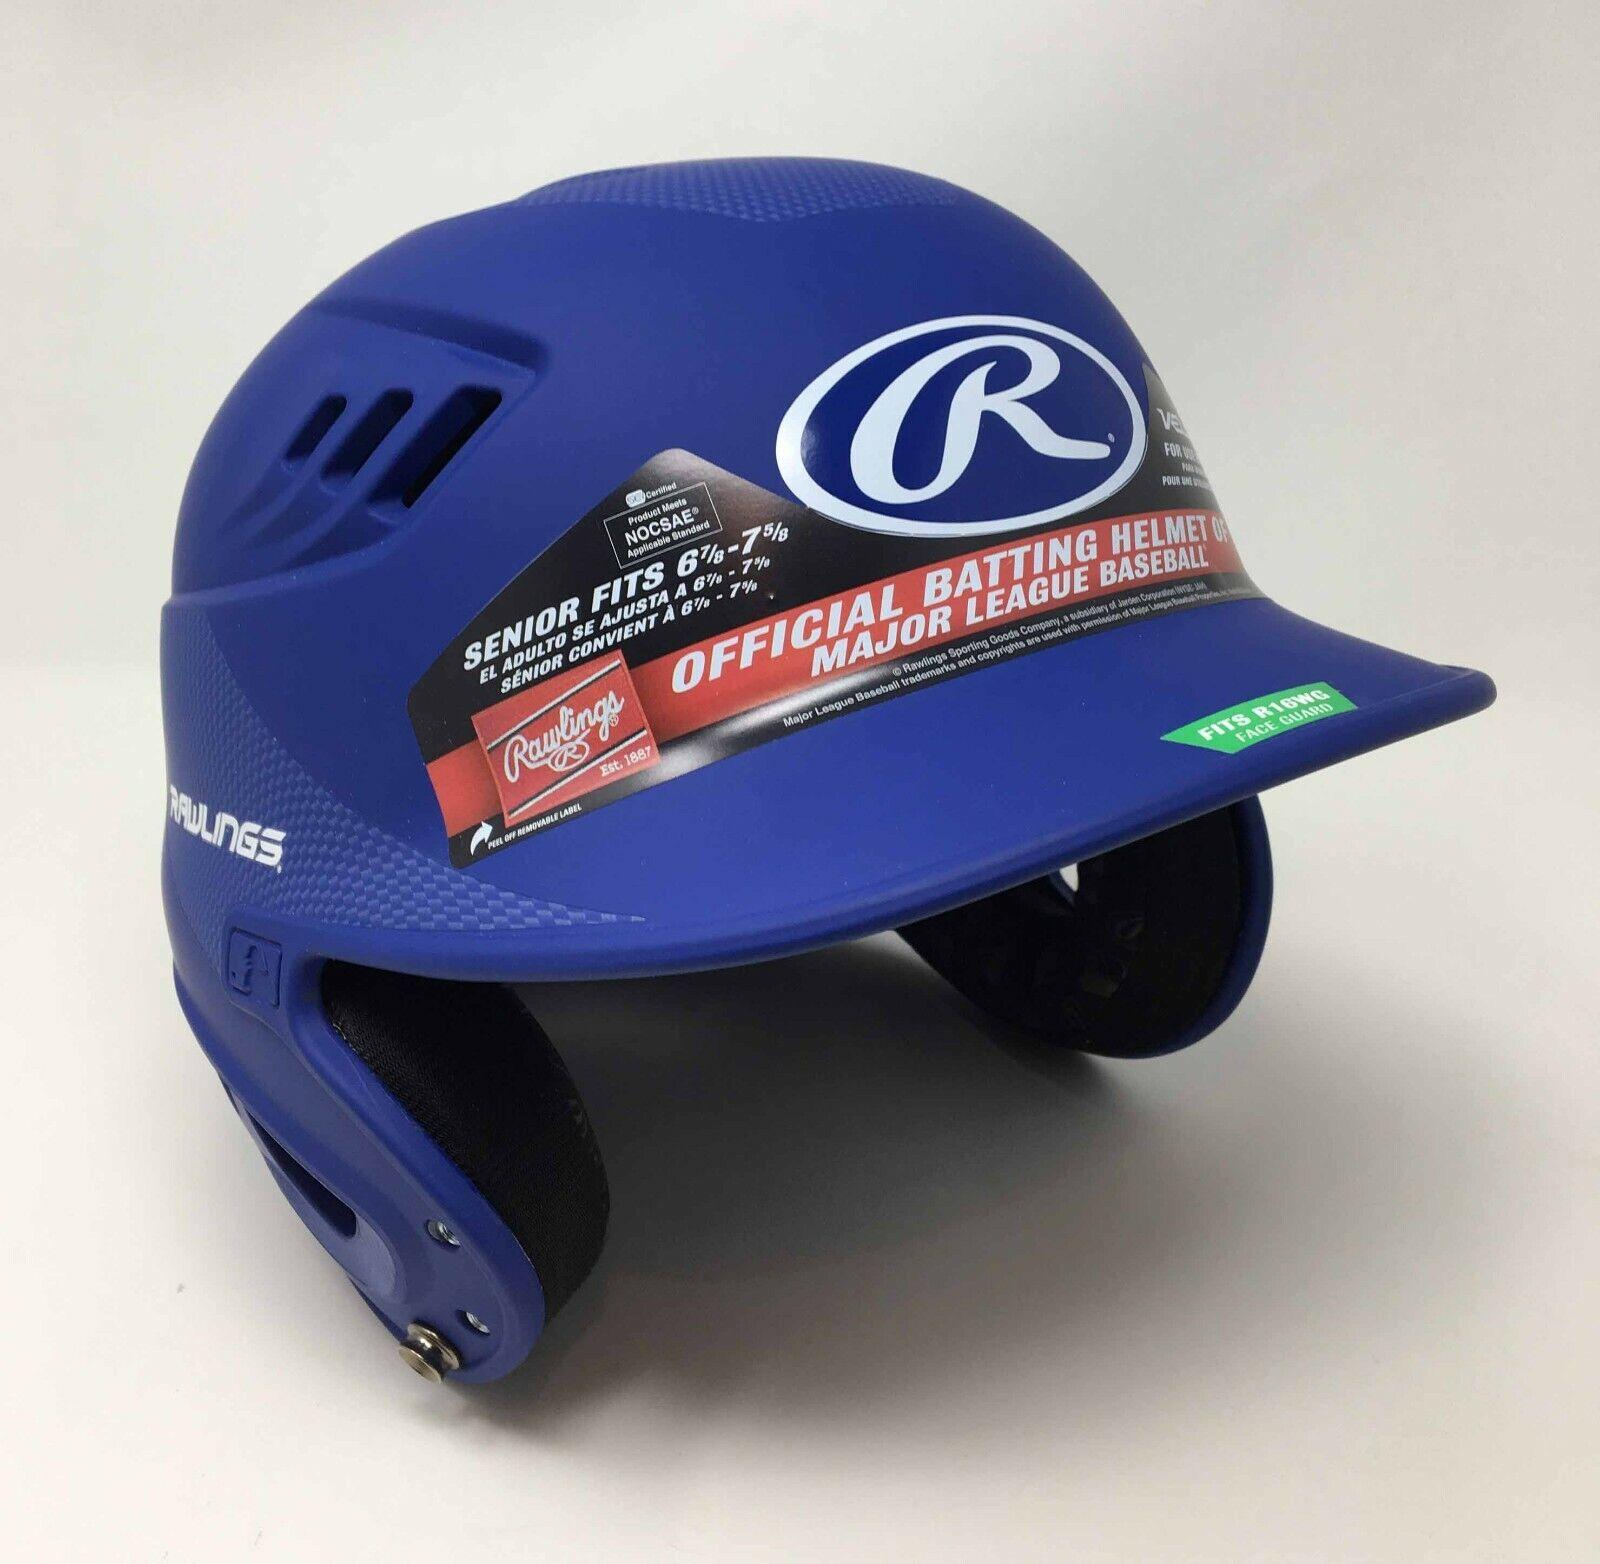 RAWLINGS Batting Helmet VELO Senior Fits 6 7 8 - 7 5 8 NEW bluee